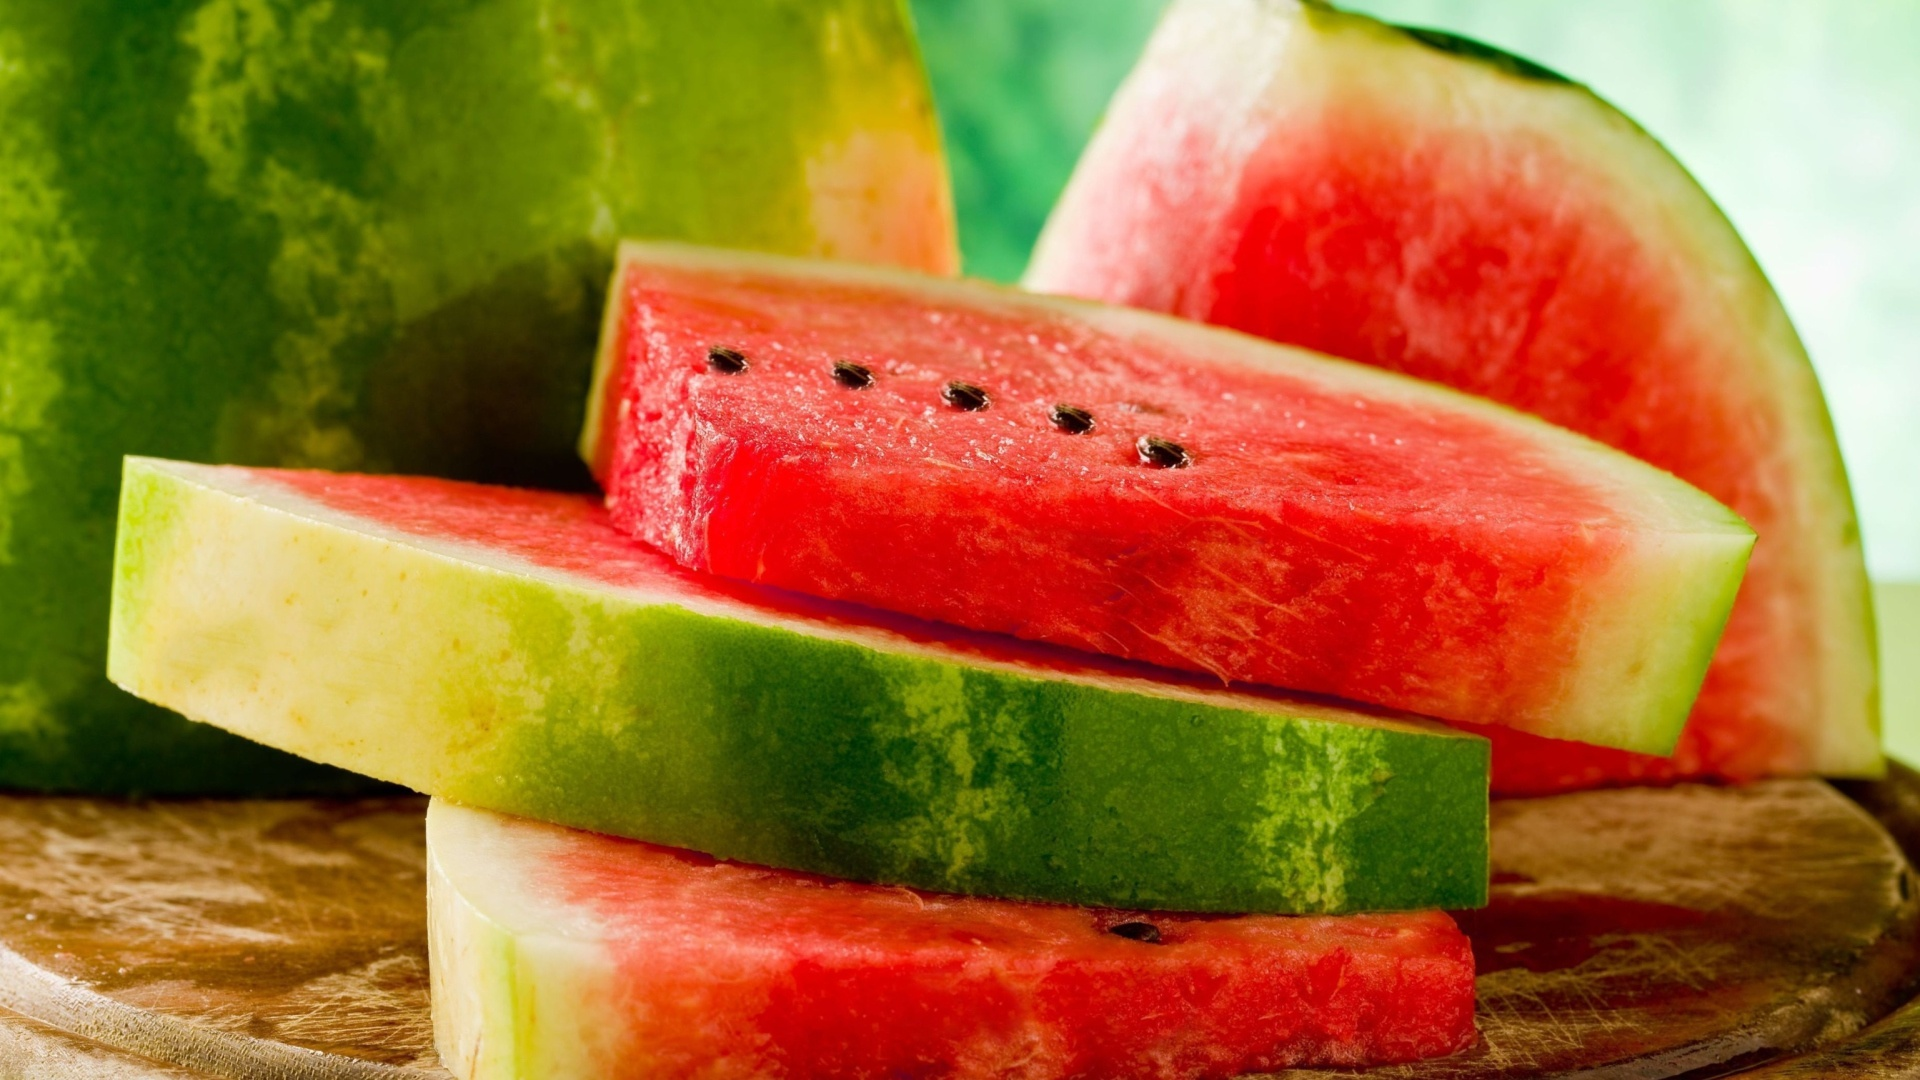 Watermelon wallpaper image hd